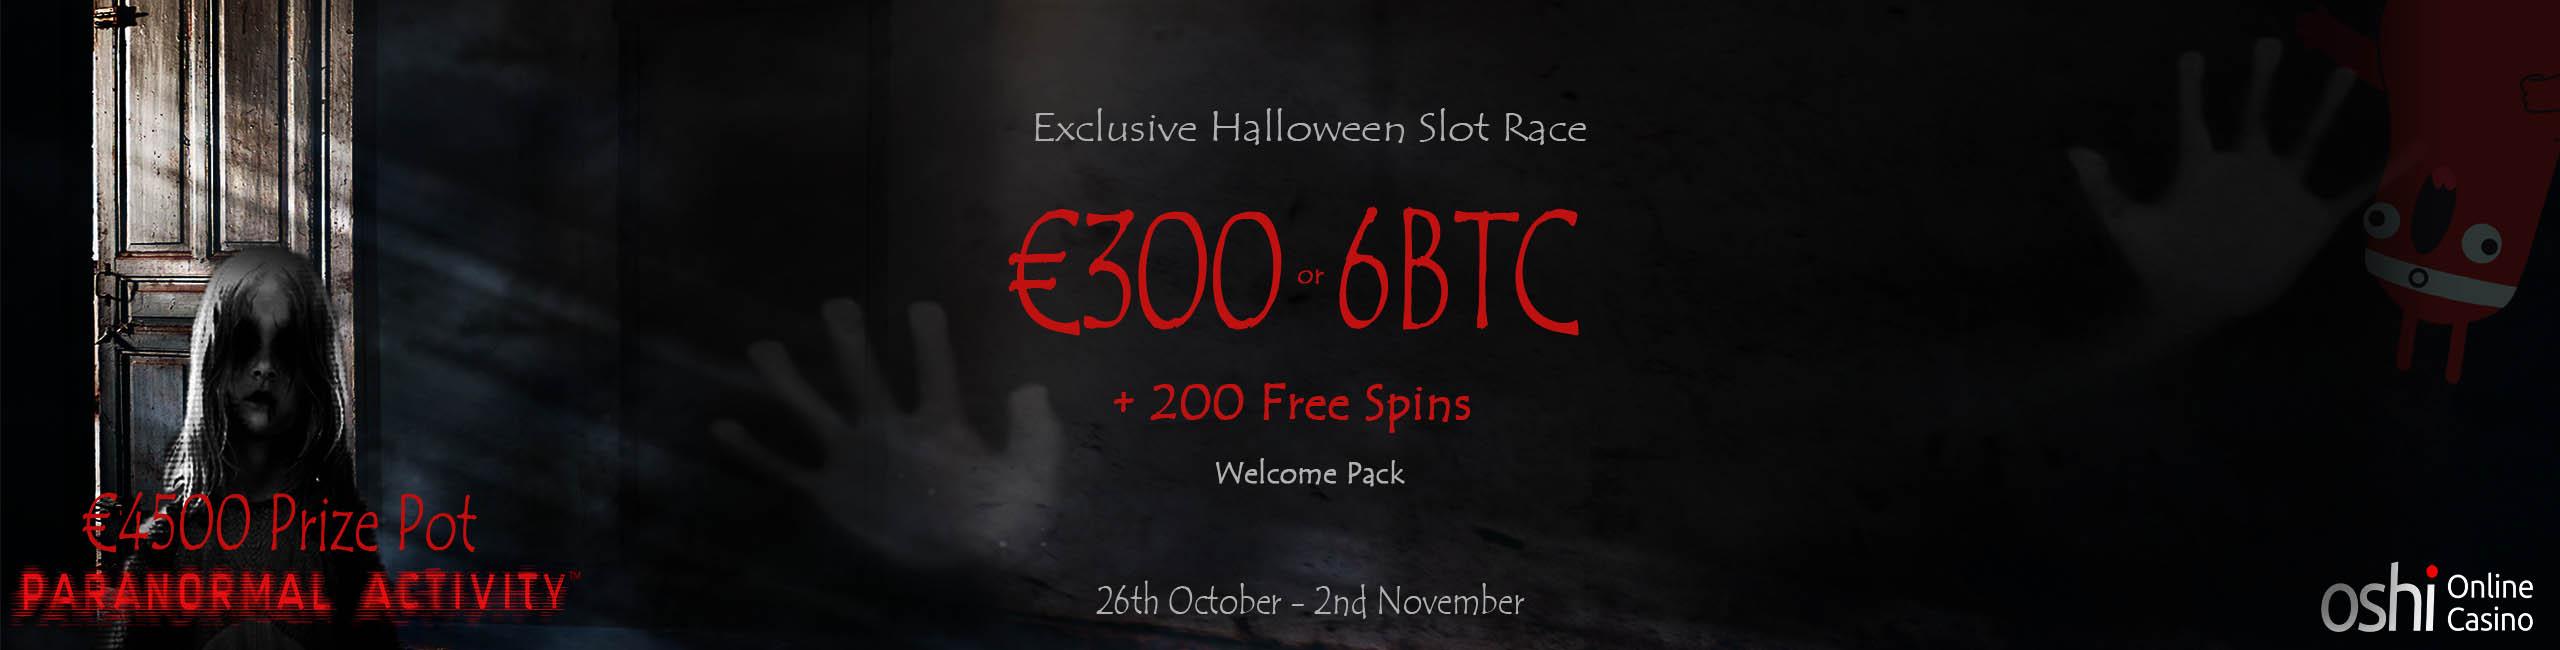 Oshi Bitcoin Casino iSoftBet Paranormal Activity